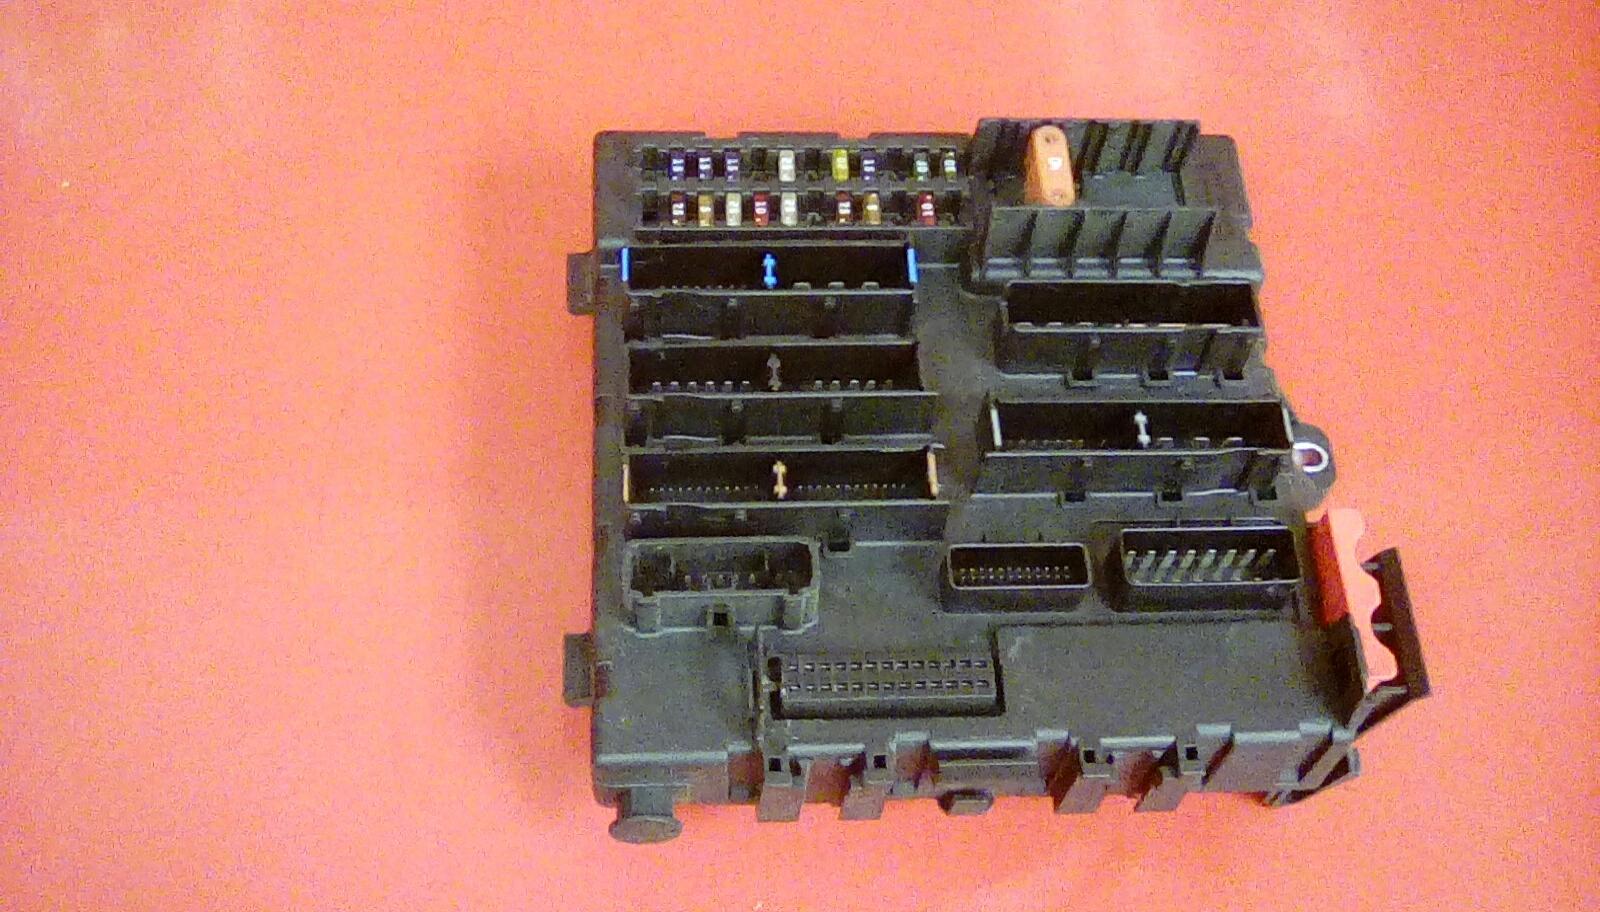 opel vectra c fuse box vauxhall vectra c rec rear electrical control module fuse box ident bj 2002-2009 used and spare ... vauxhall vectra rear fuse box #12